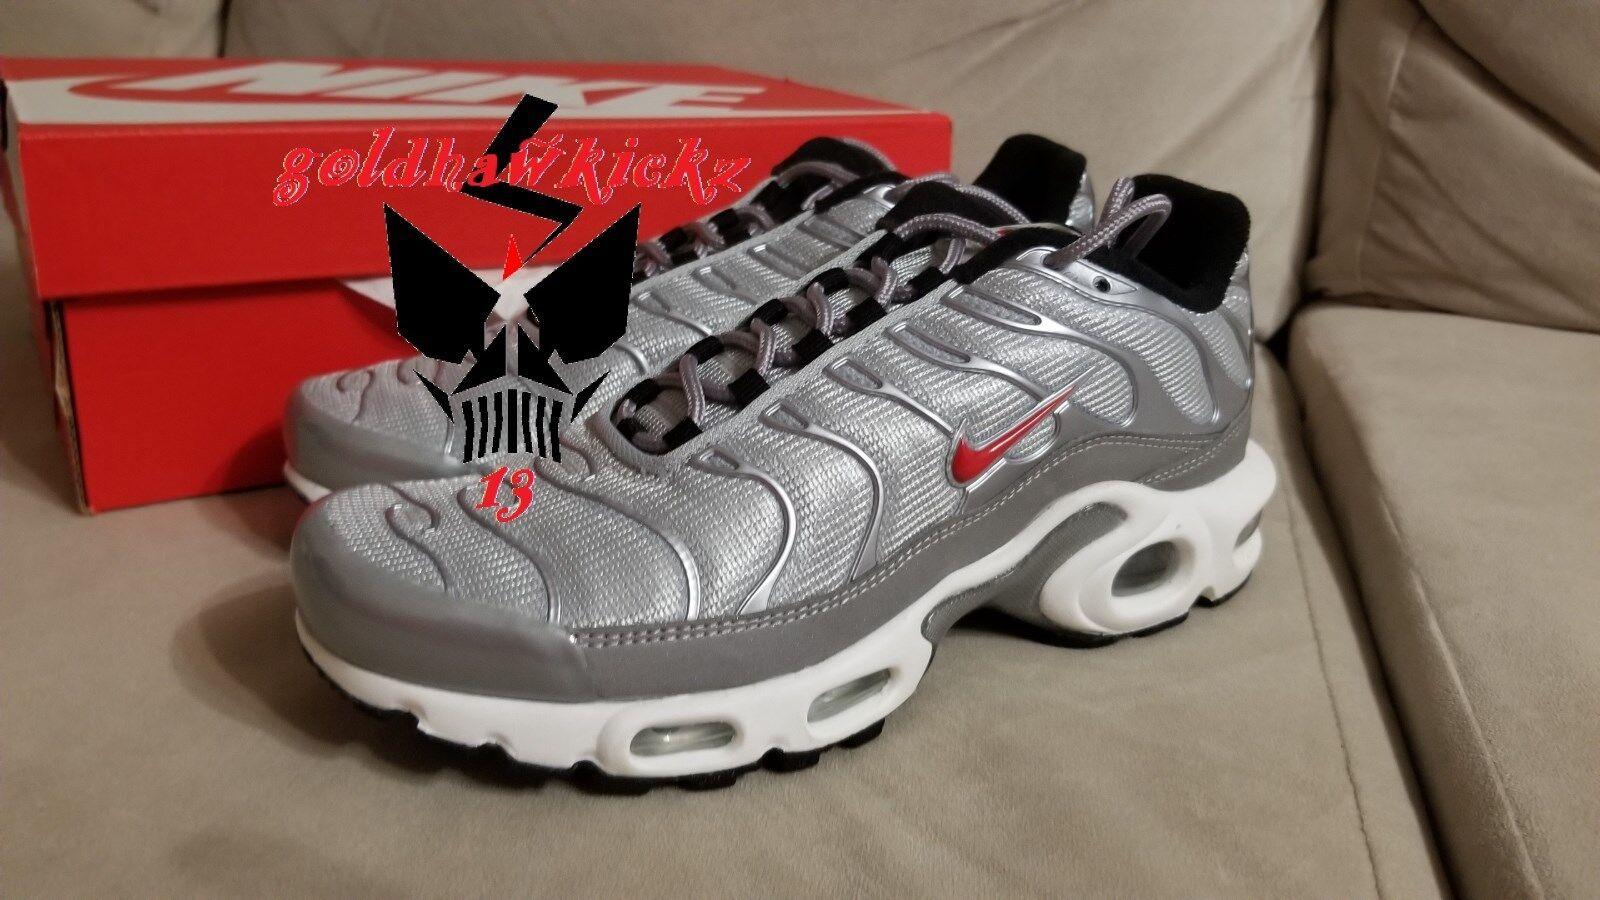 nike air max plus QS 887092 001 metallic Silver Bullet nikelab women running 3m